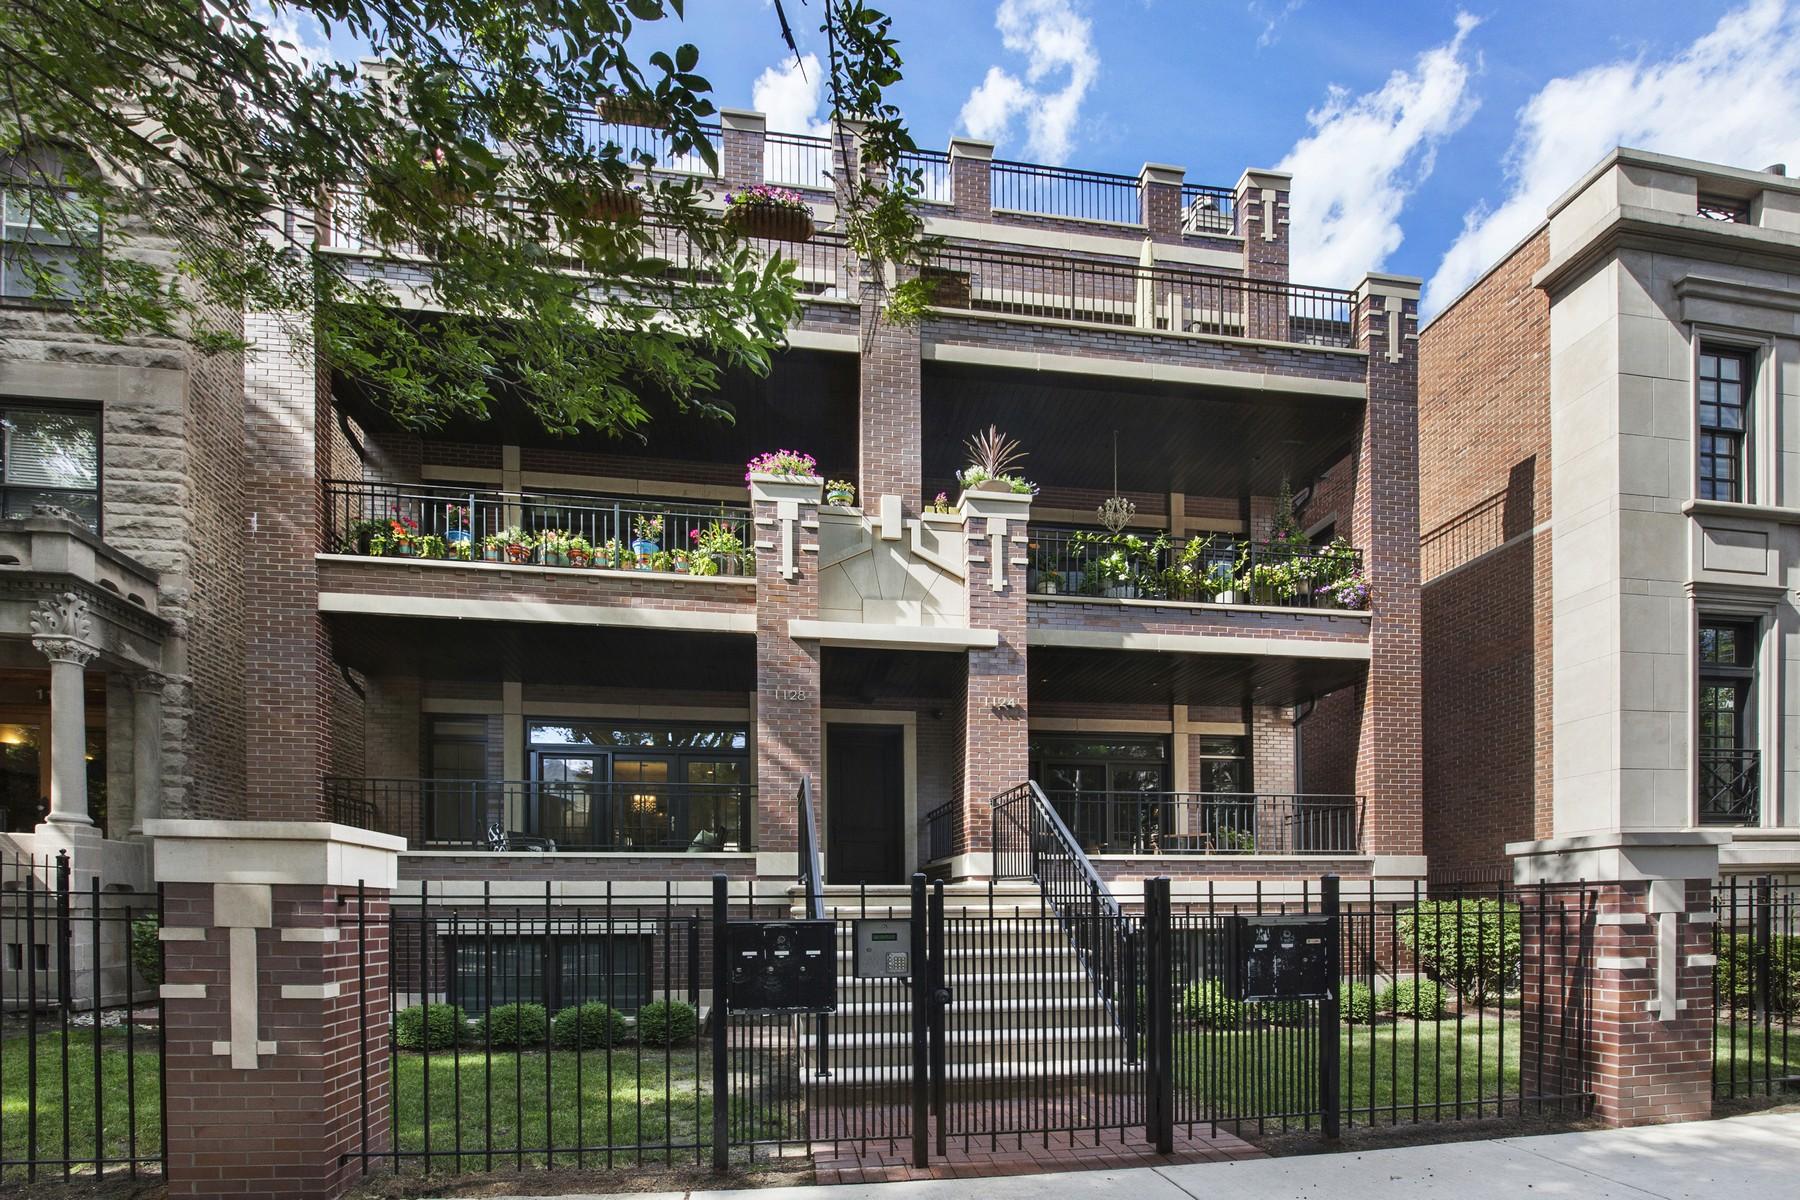 Dubleks için Satış at Luxurious Lincoln Park Duplex 1124 W Wrightwood Avenue Unit 1E Lincoln Park, Chicago, Illinois, 60614 Amerika Birleşik Devletleri